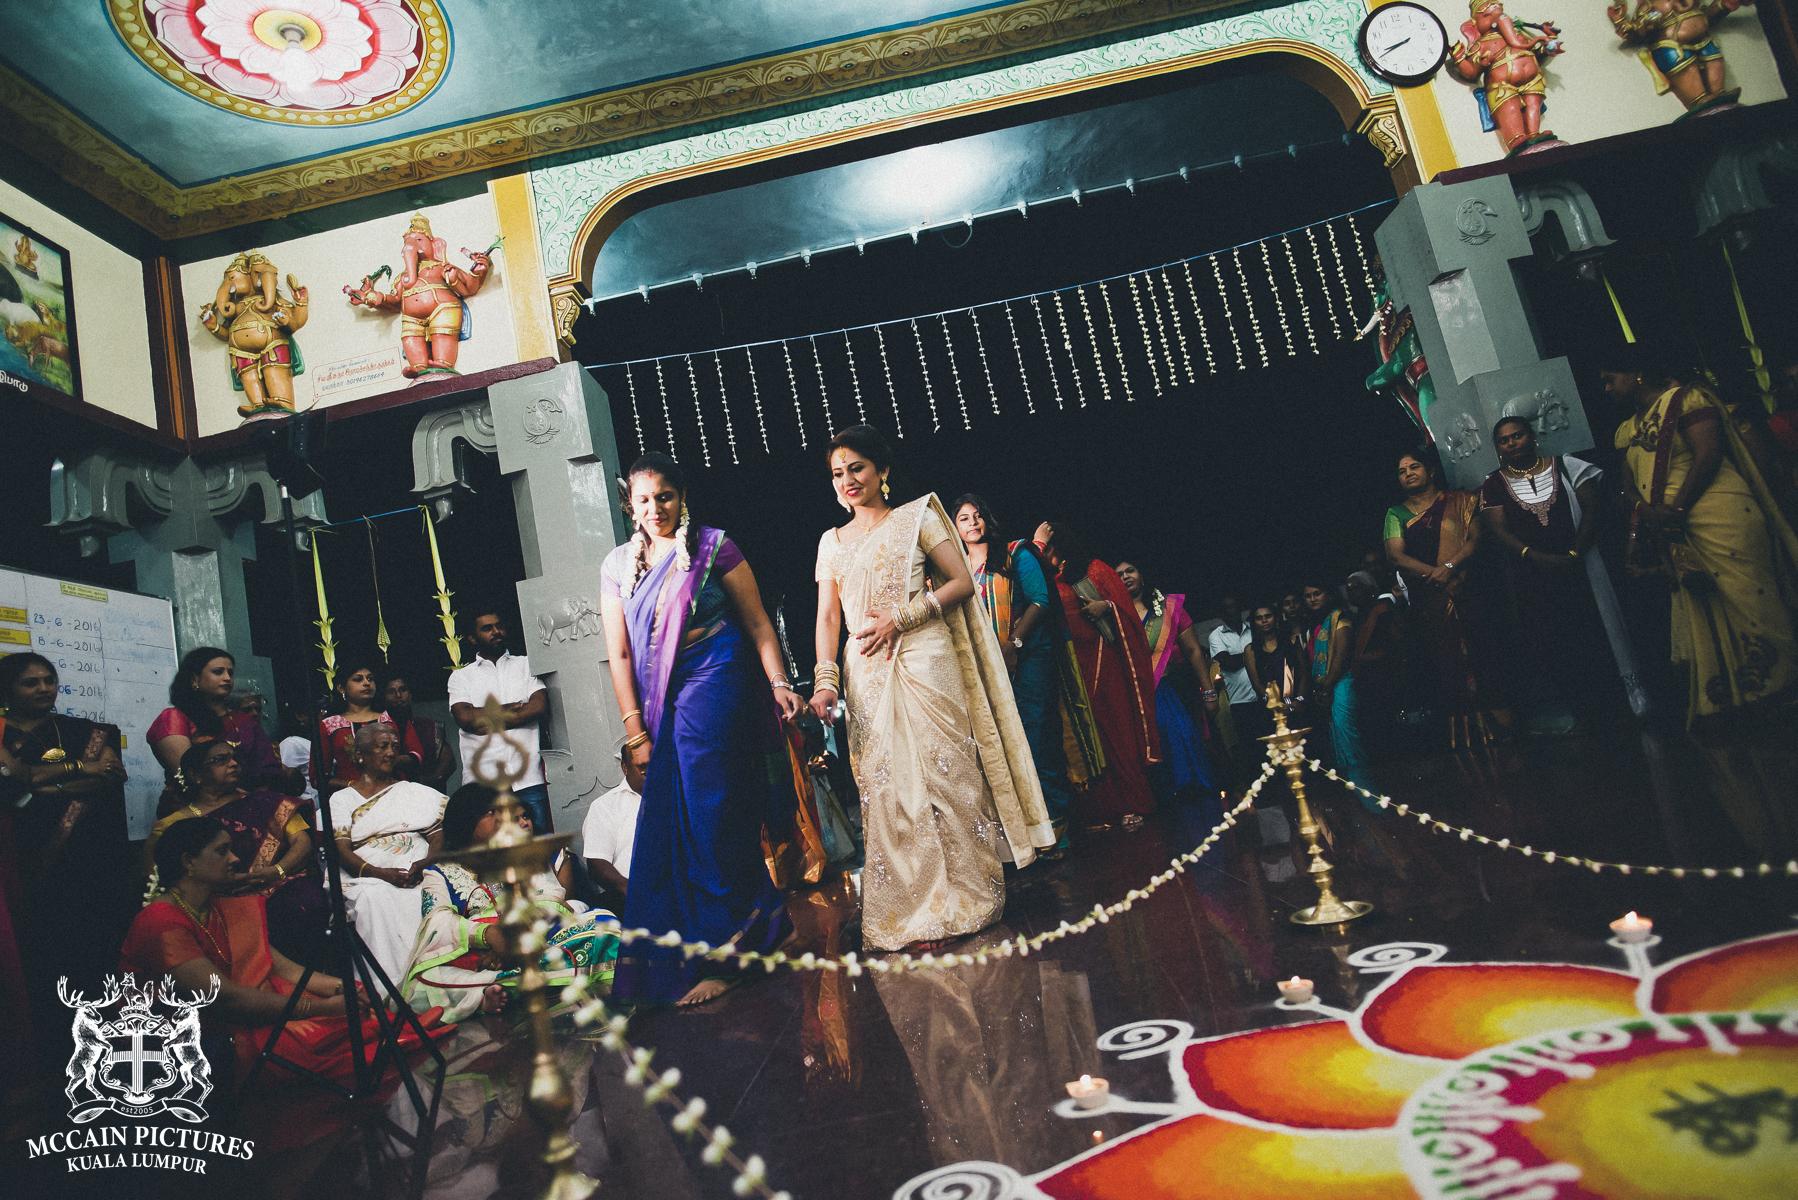 mccain goh mccain pictures wedding photographer malaysia-361